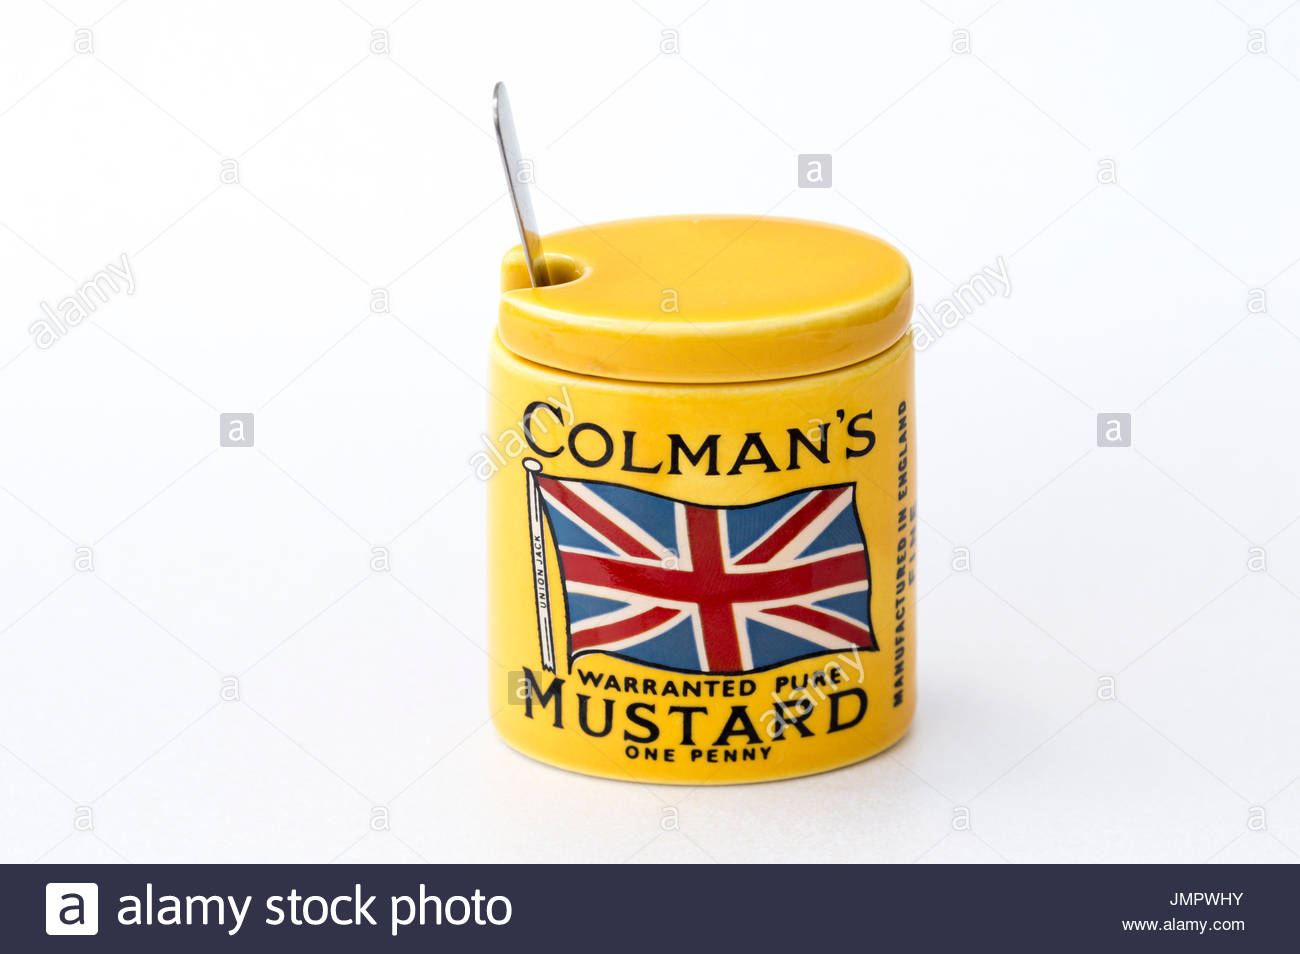 Coleman's Union Jack Mustard Pot and Spoon, Dorset, England, UK GB - Stock Image